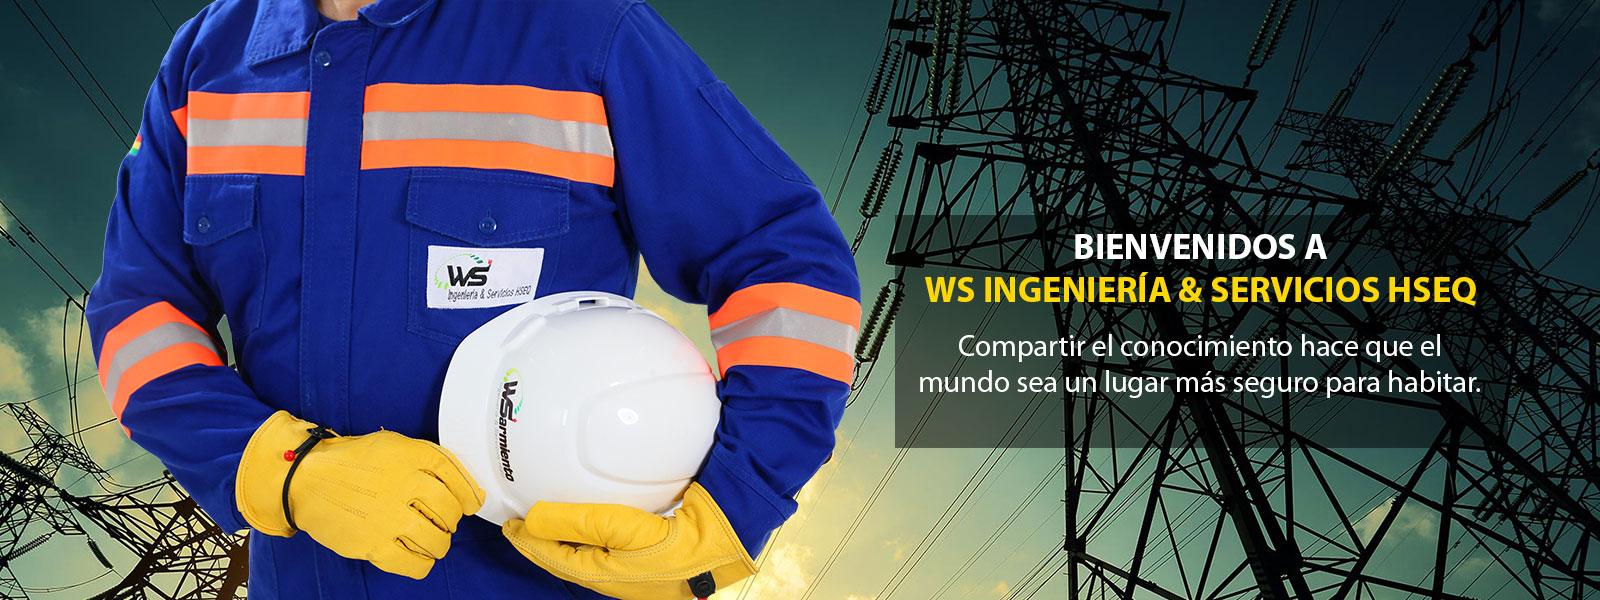 wsafe-industrias-electricas